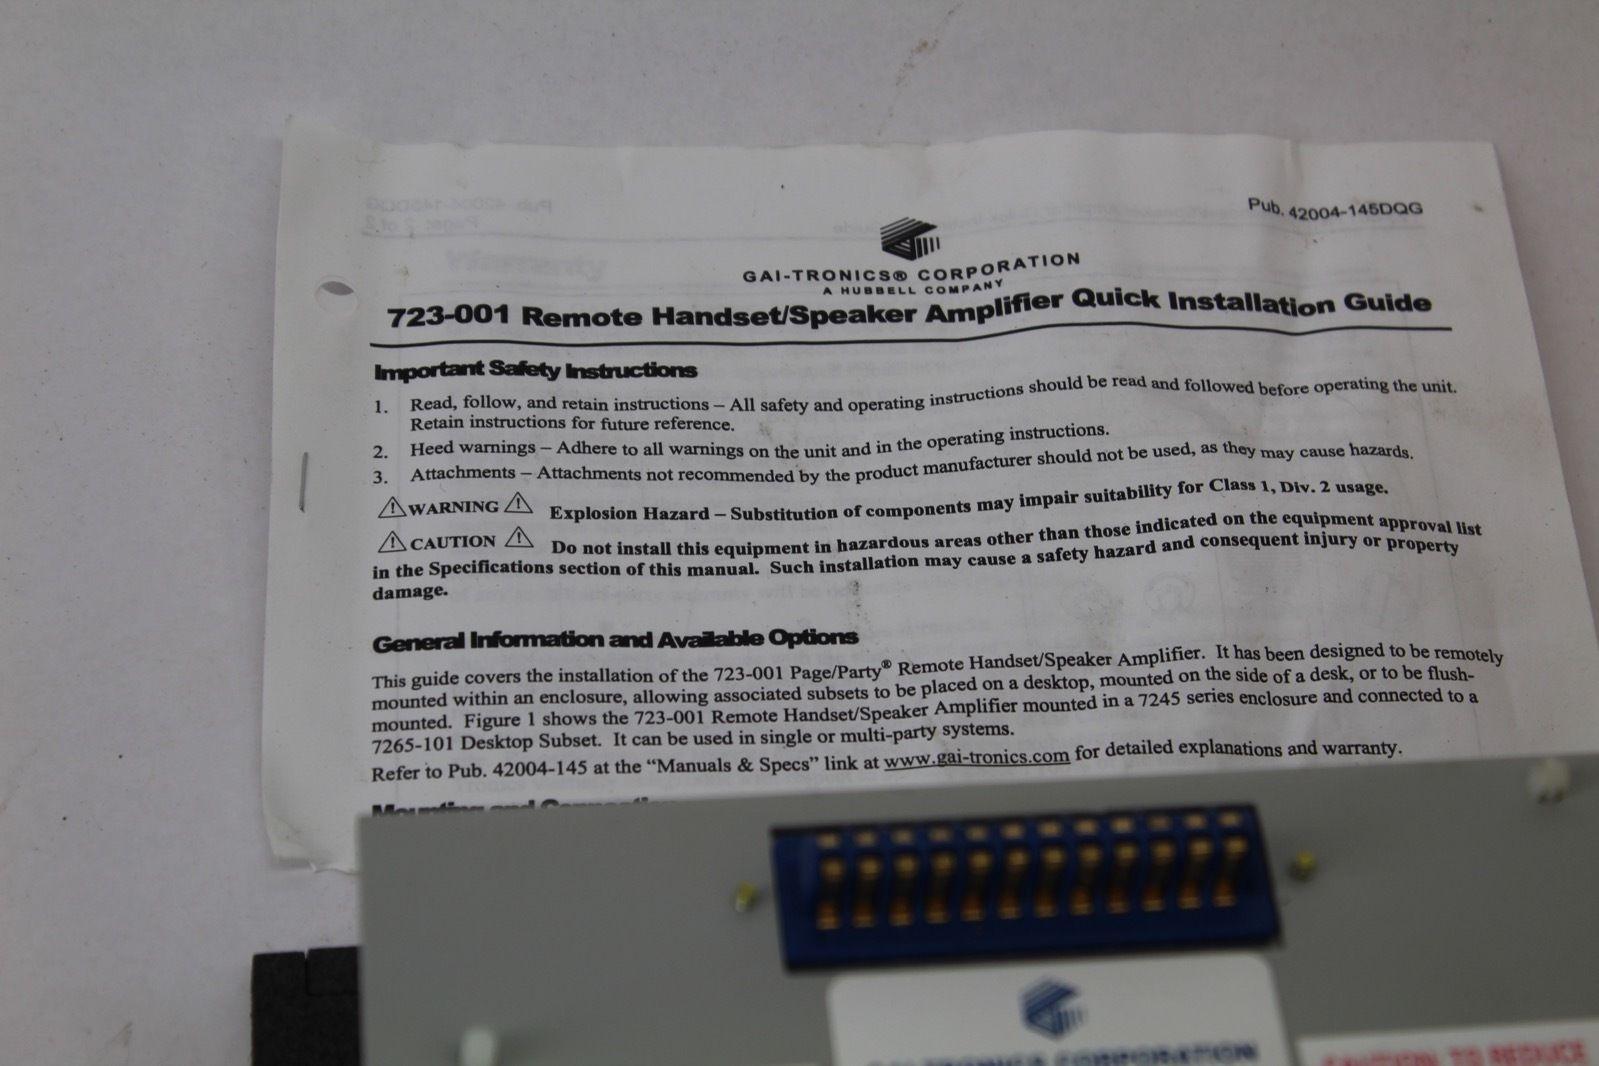 GAI-Tronics Amplifier Remote GTK85104B *NEW* (B232) 4